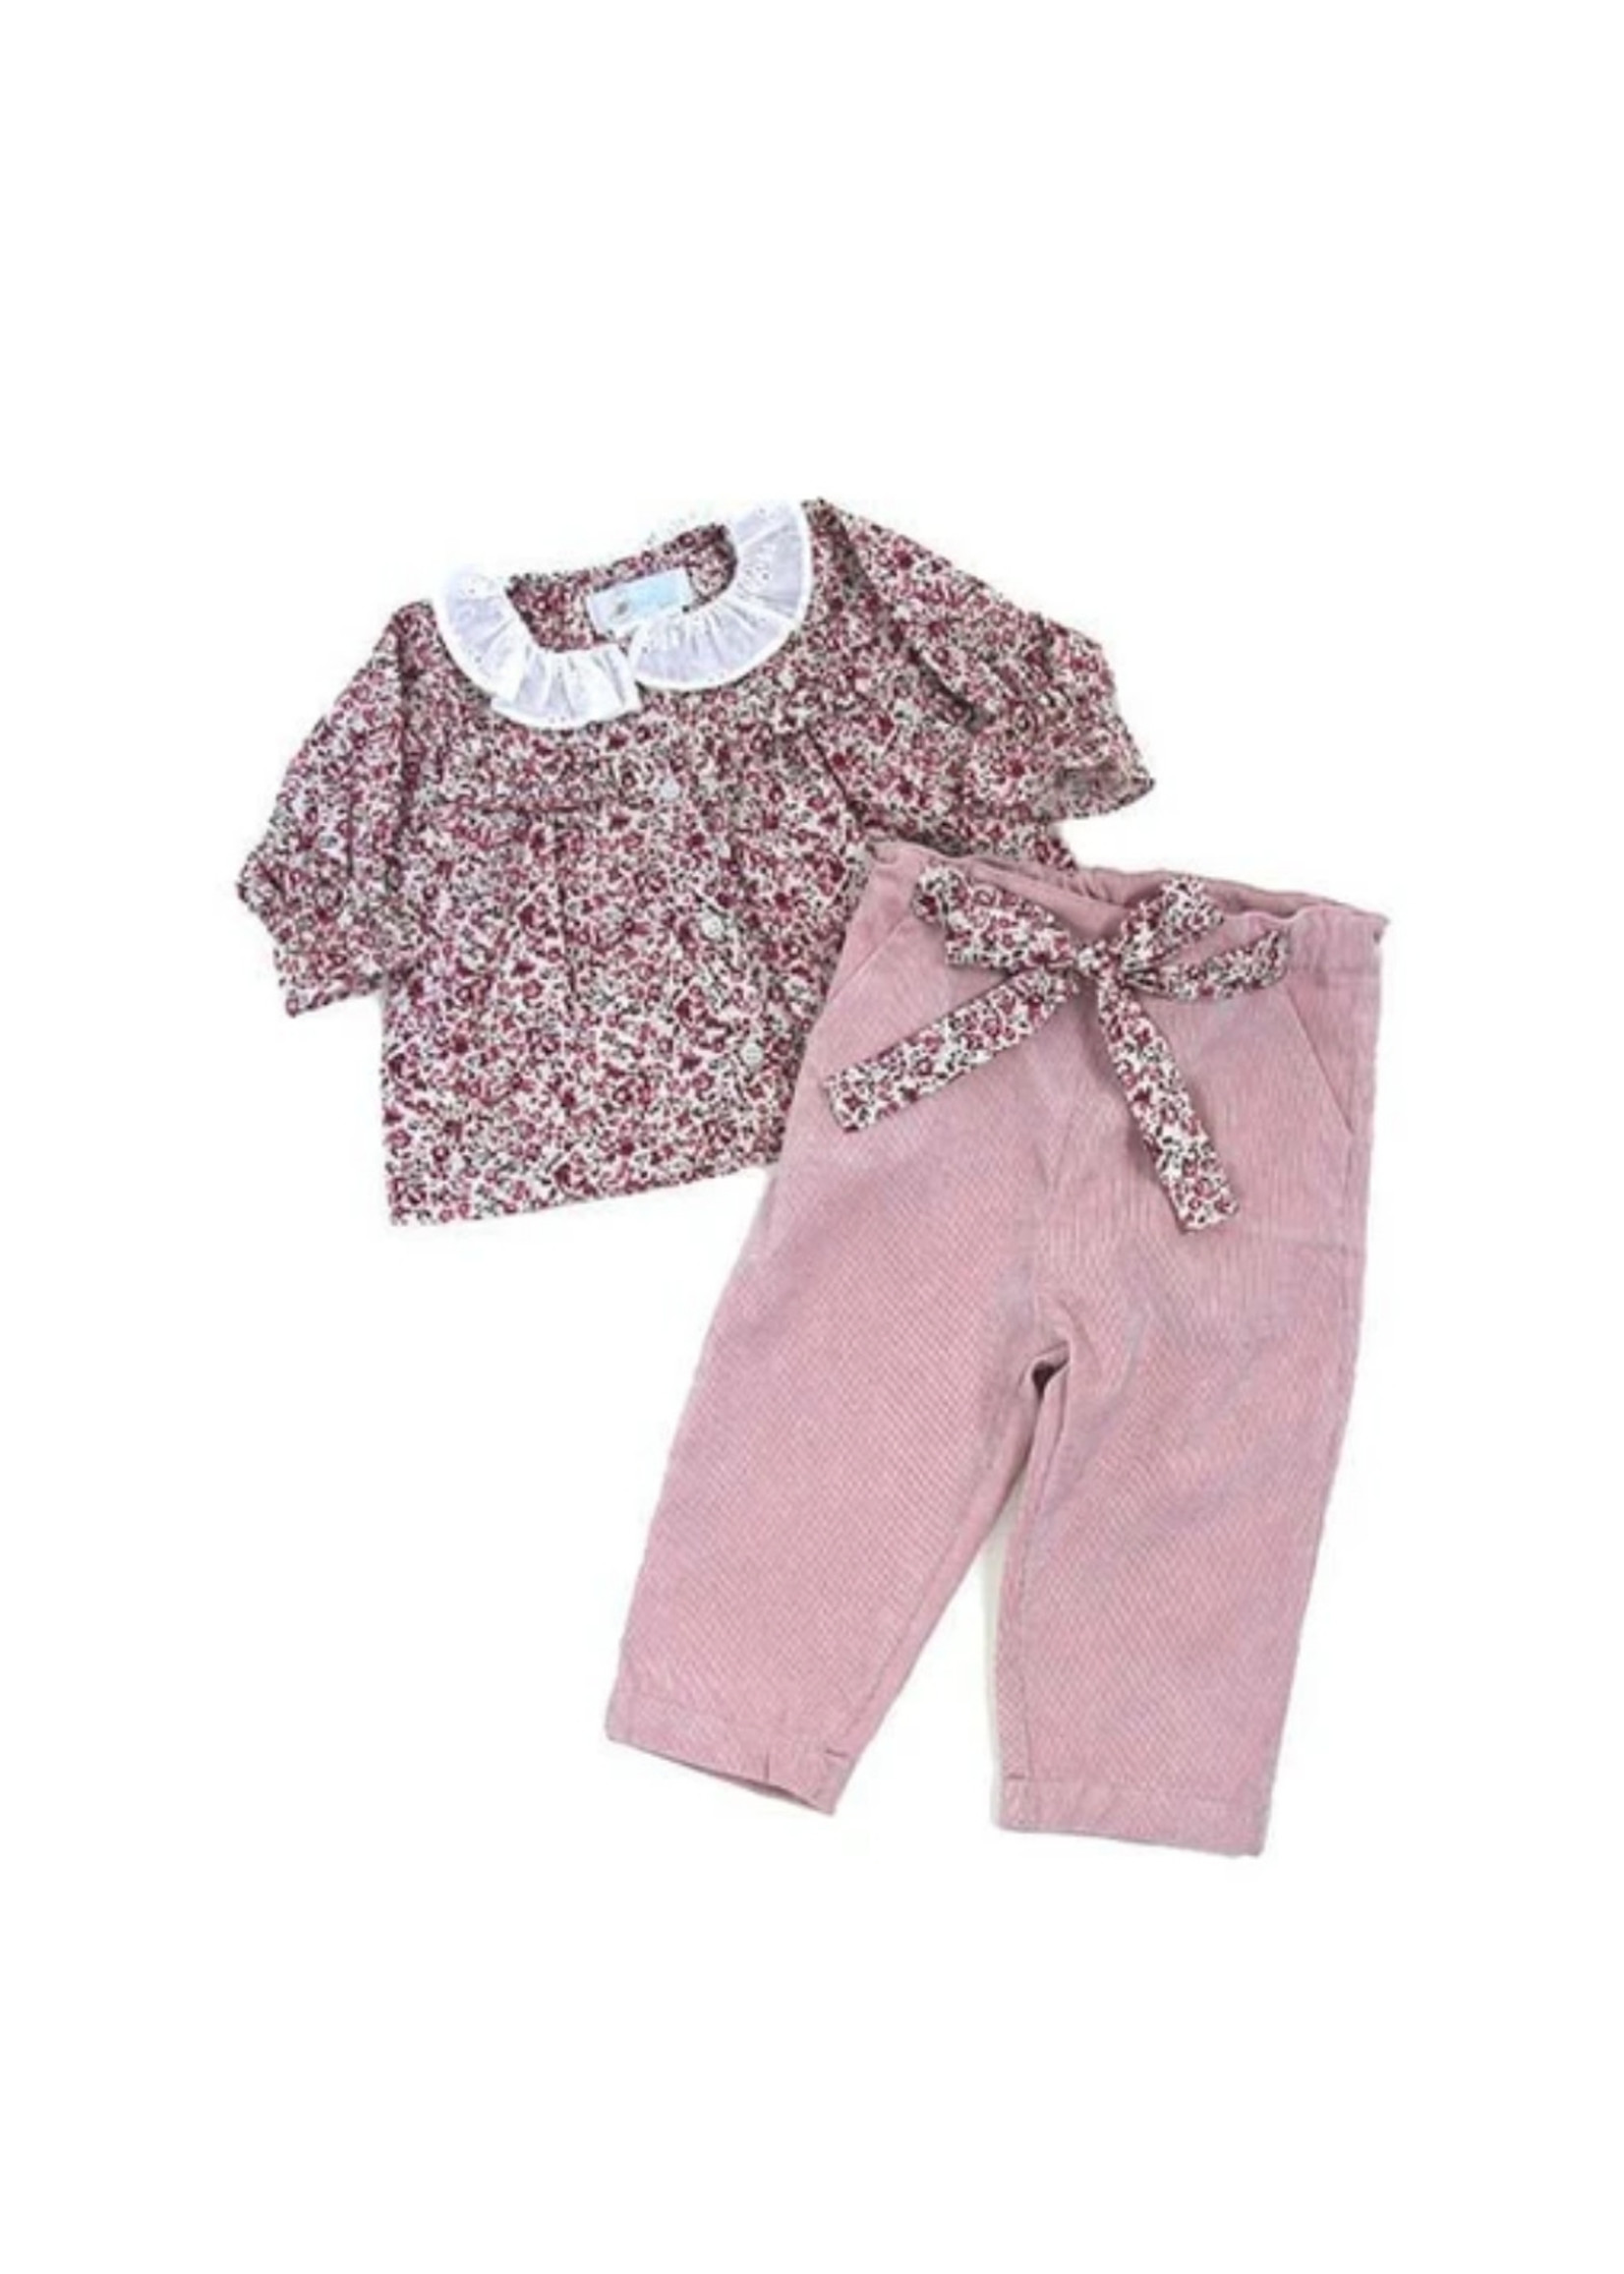 Cuclie Cuclie Freesia Rose Blouse and Pant Set